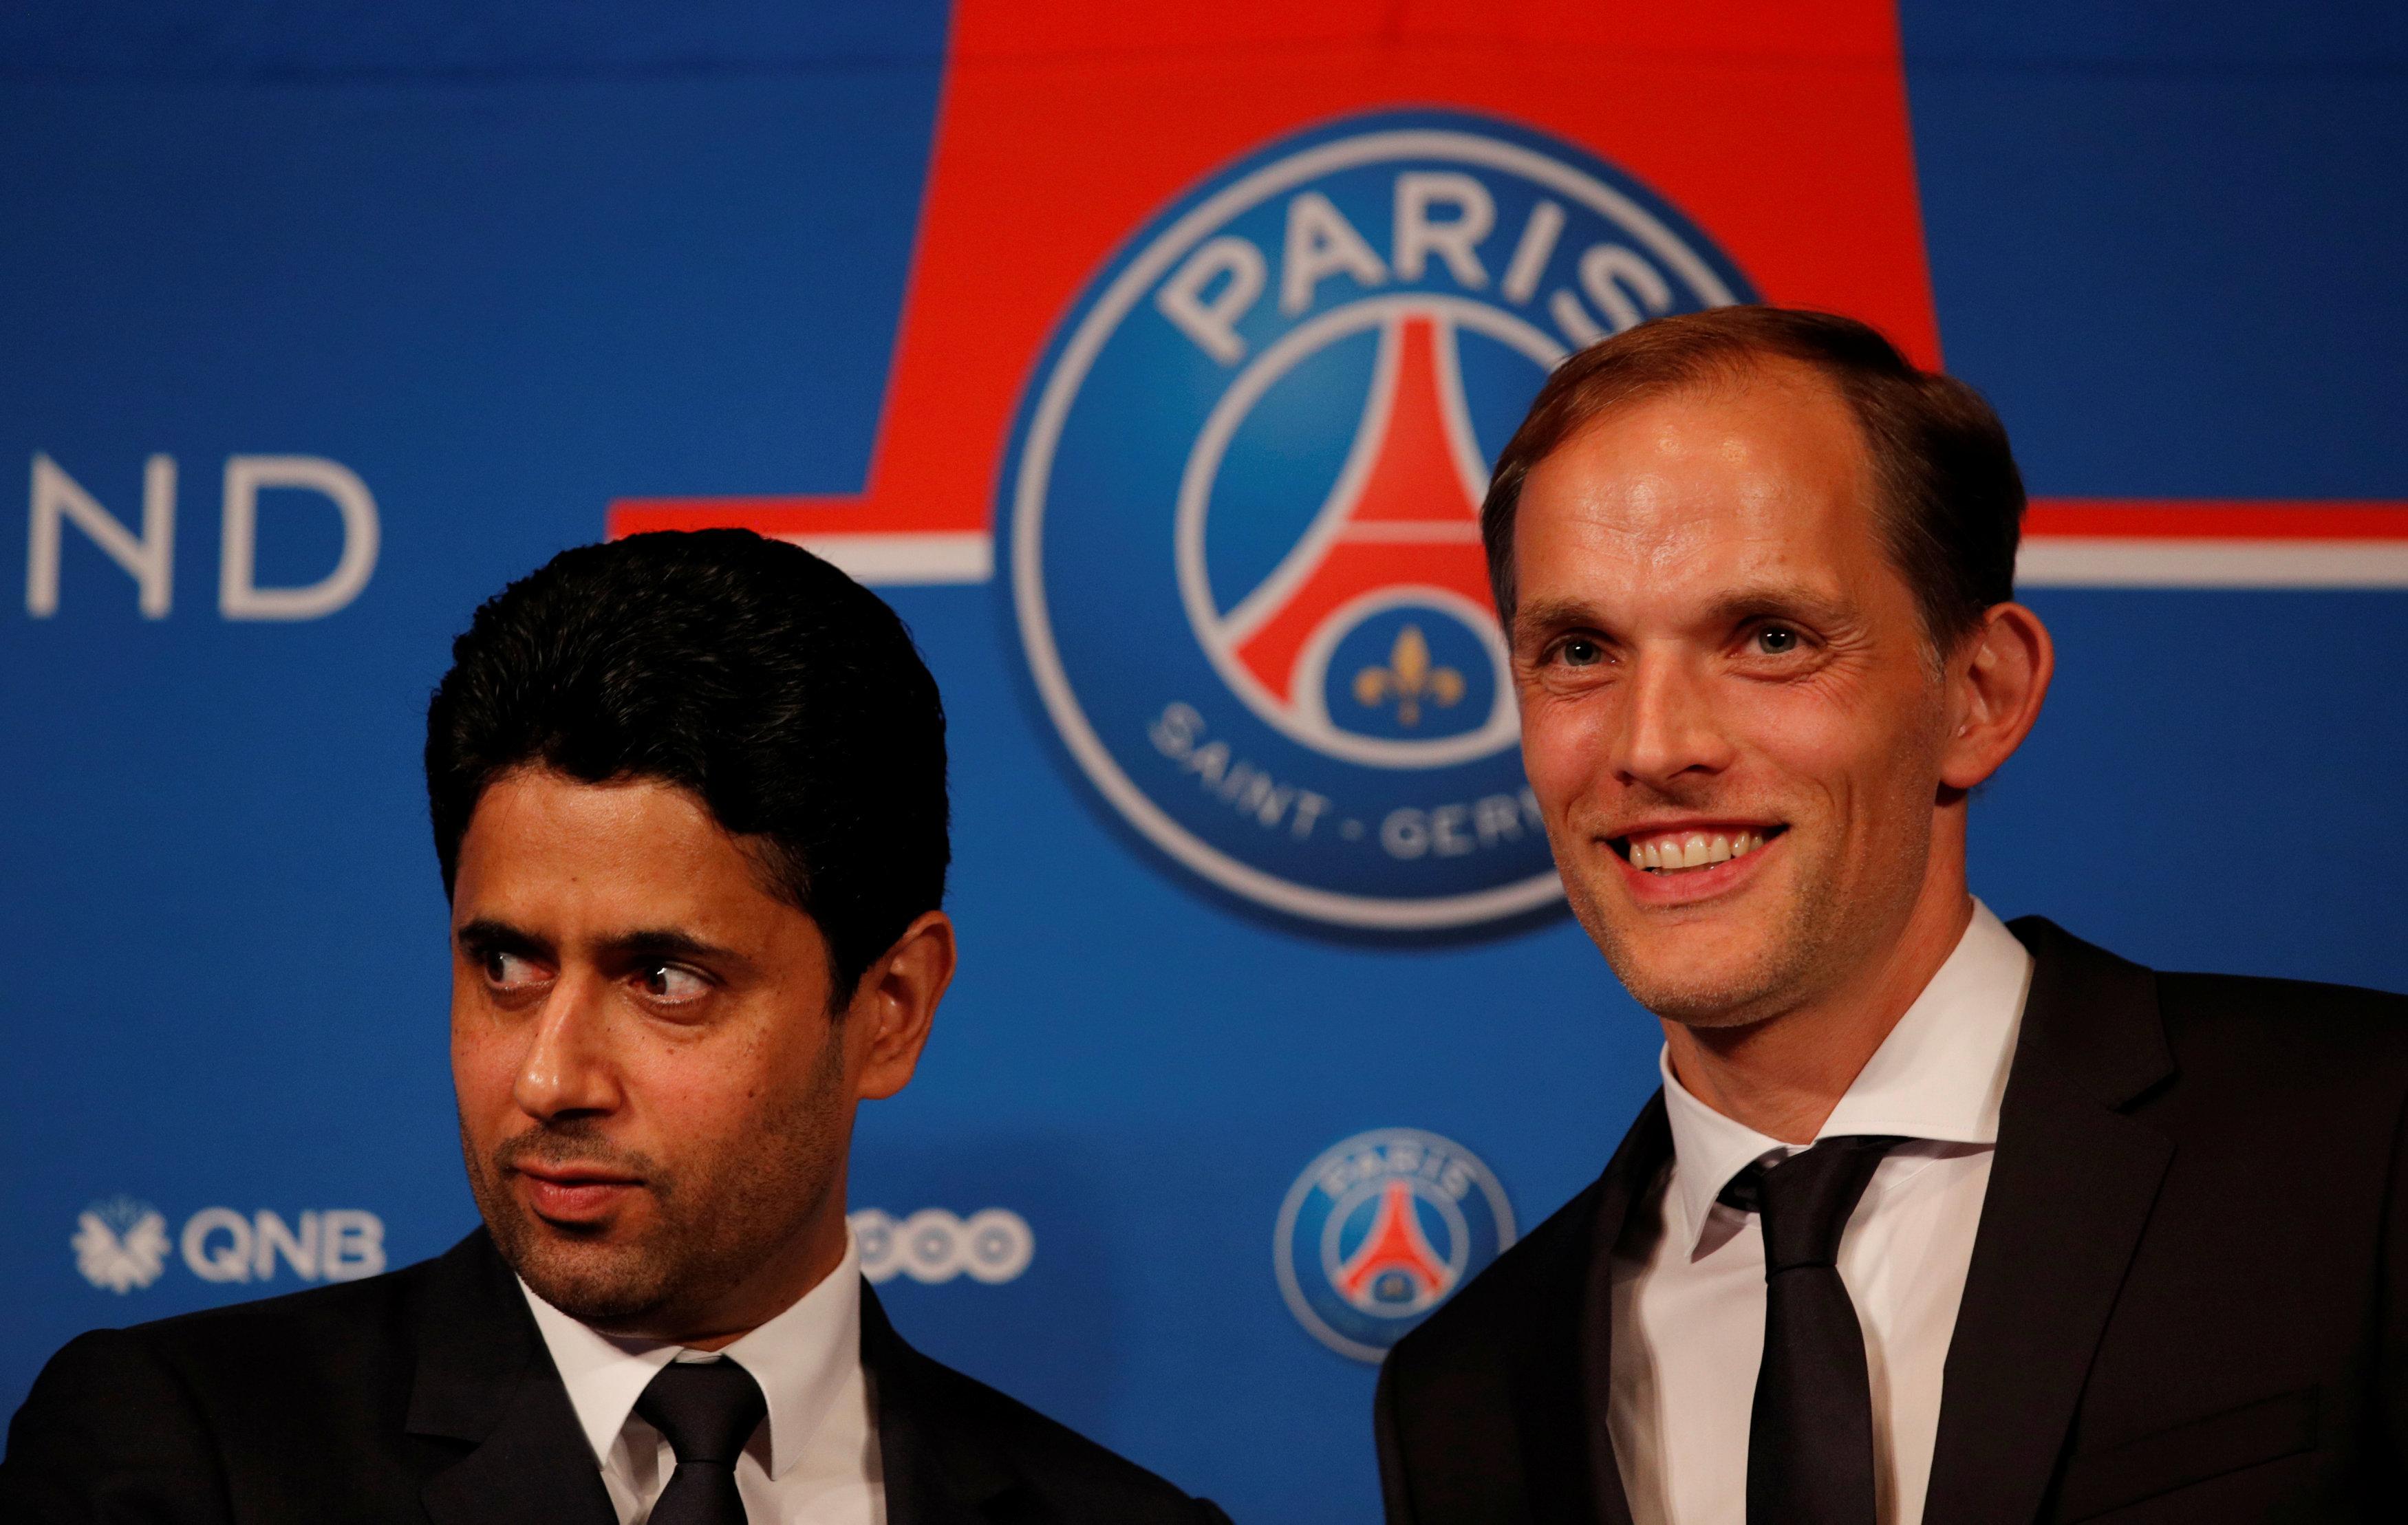 Football - Ligue 1 - PSG : Thomas Tuchel prolongé jusqu'en 2022 ?